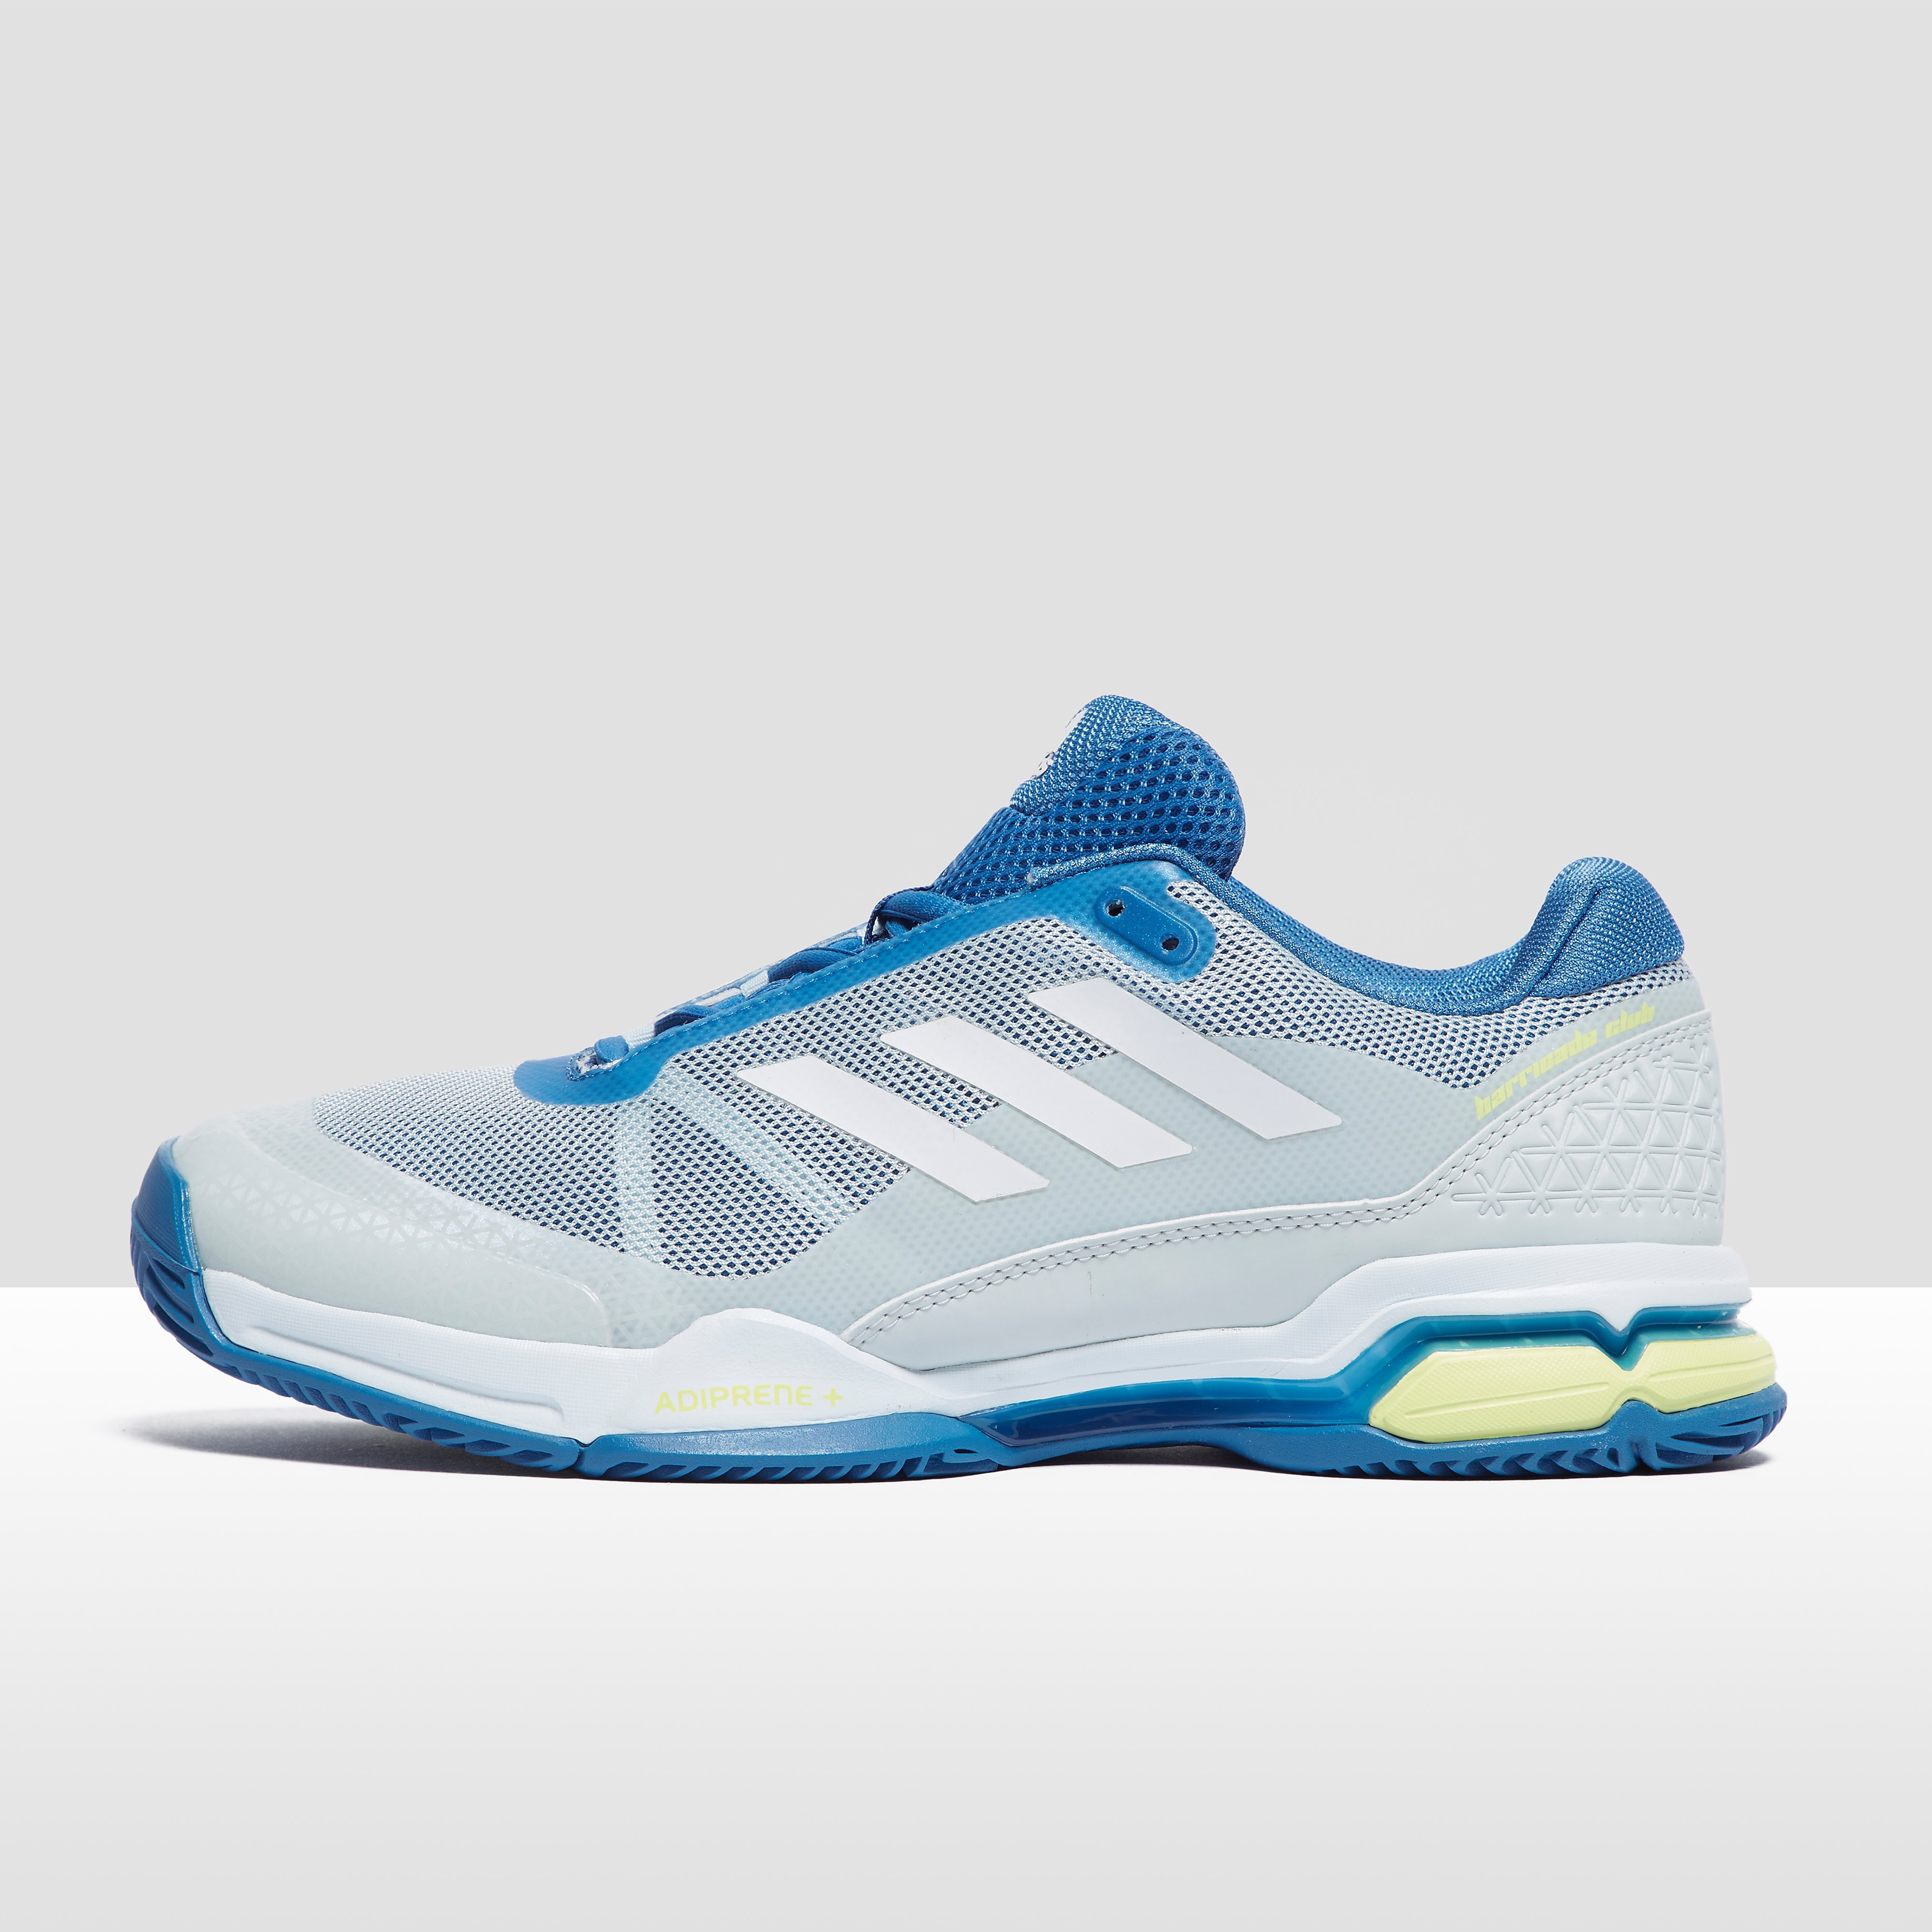 adidas Barricade Club 2017 Men's Tennis Shoes